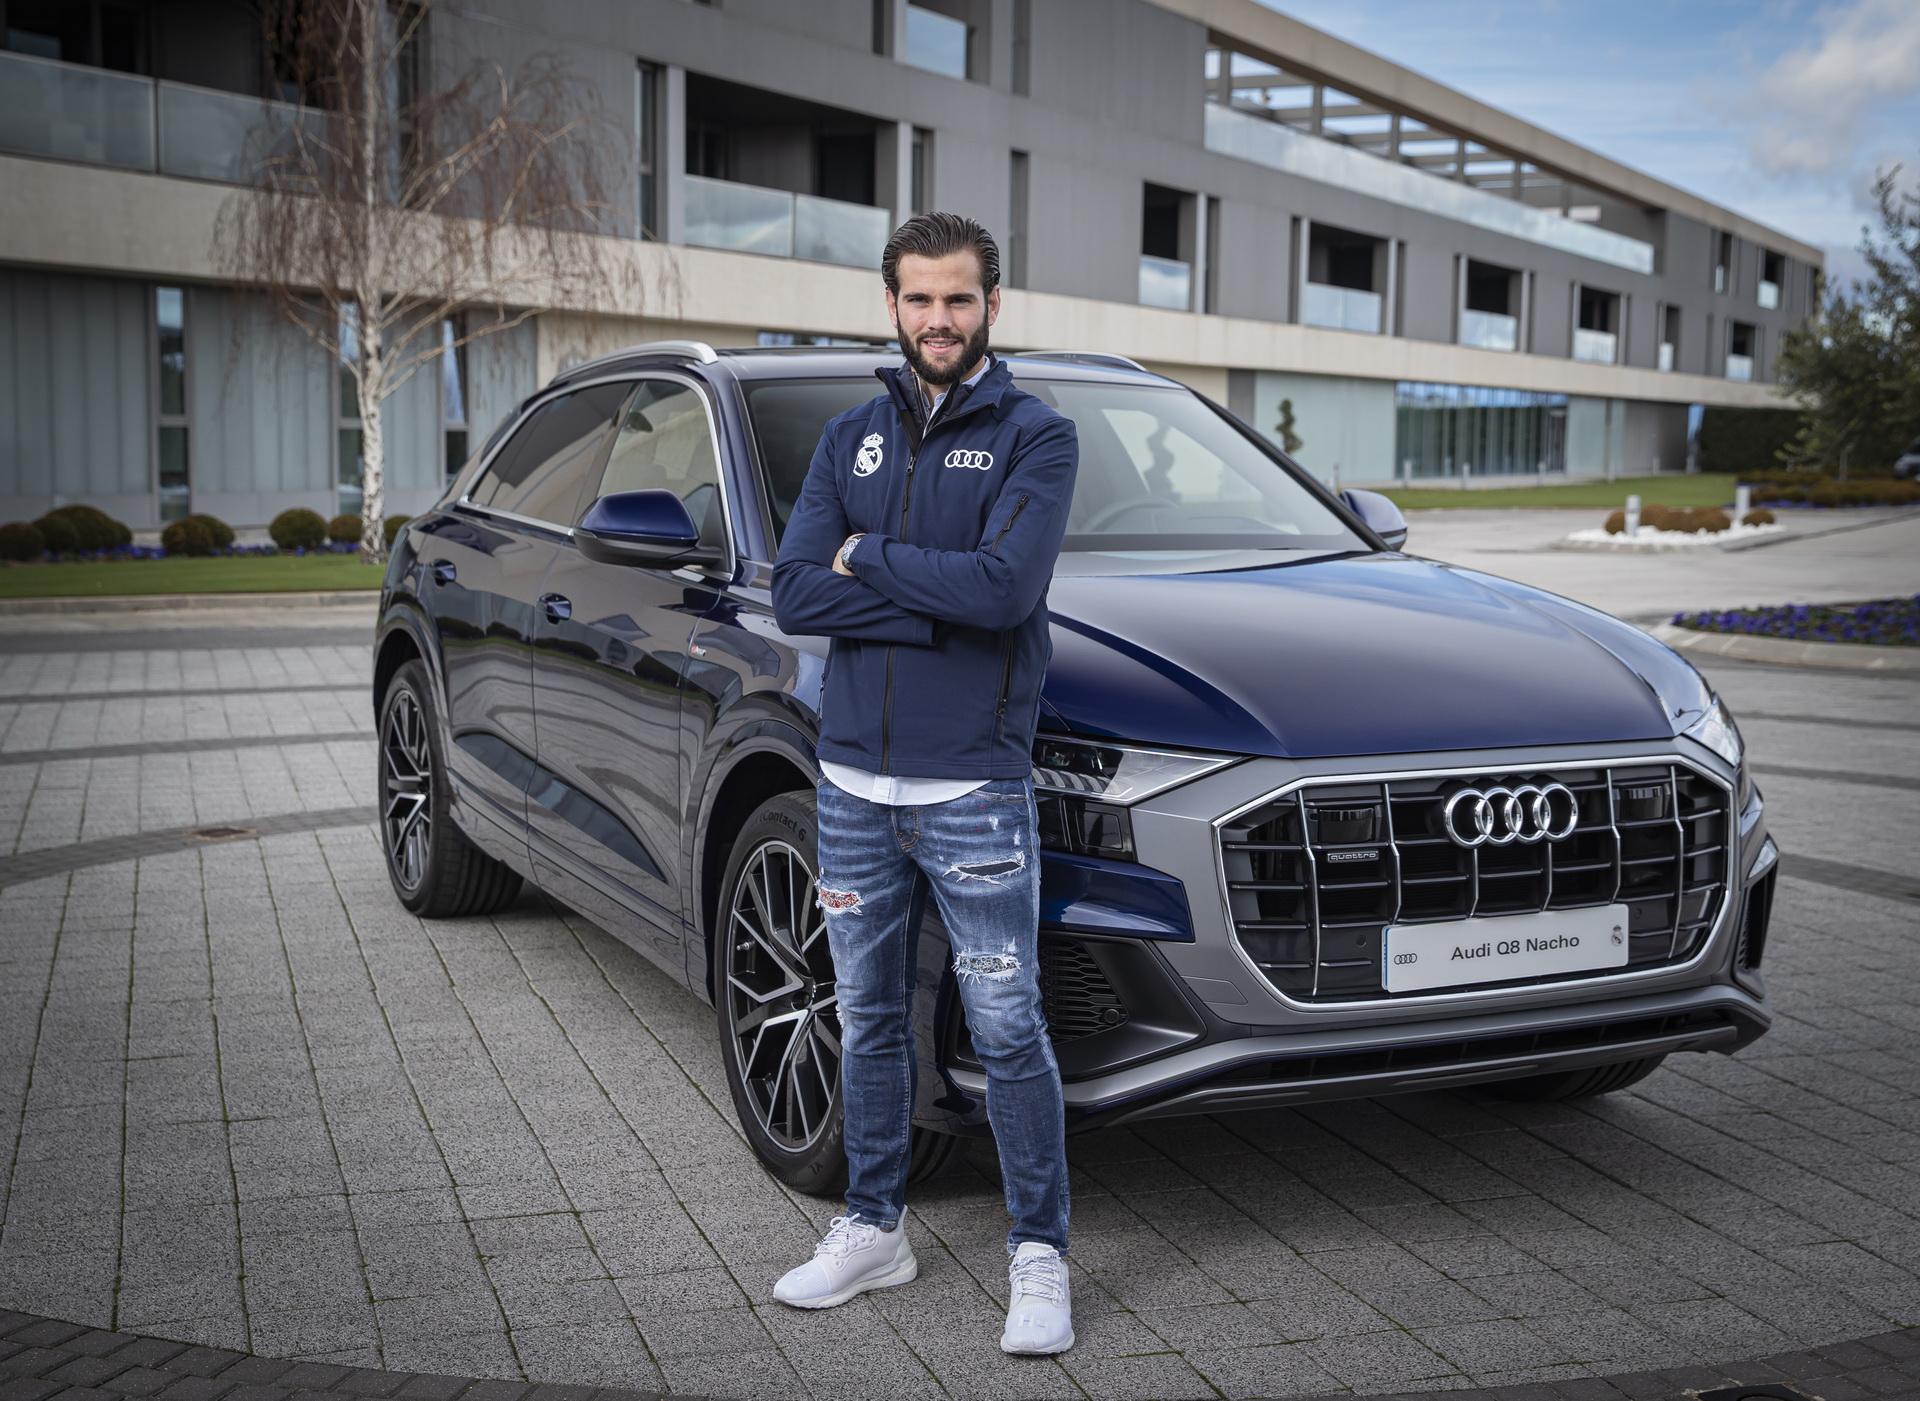 Real_Madrid_Players_Audi_0036